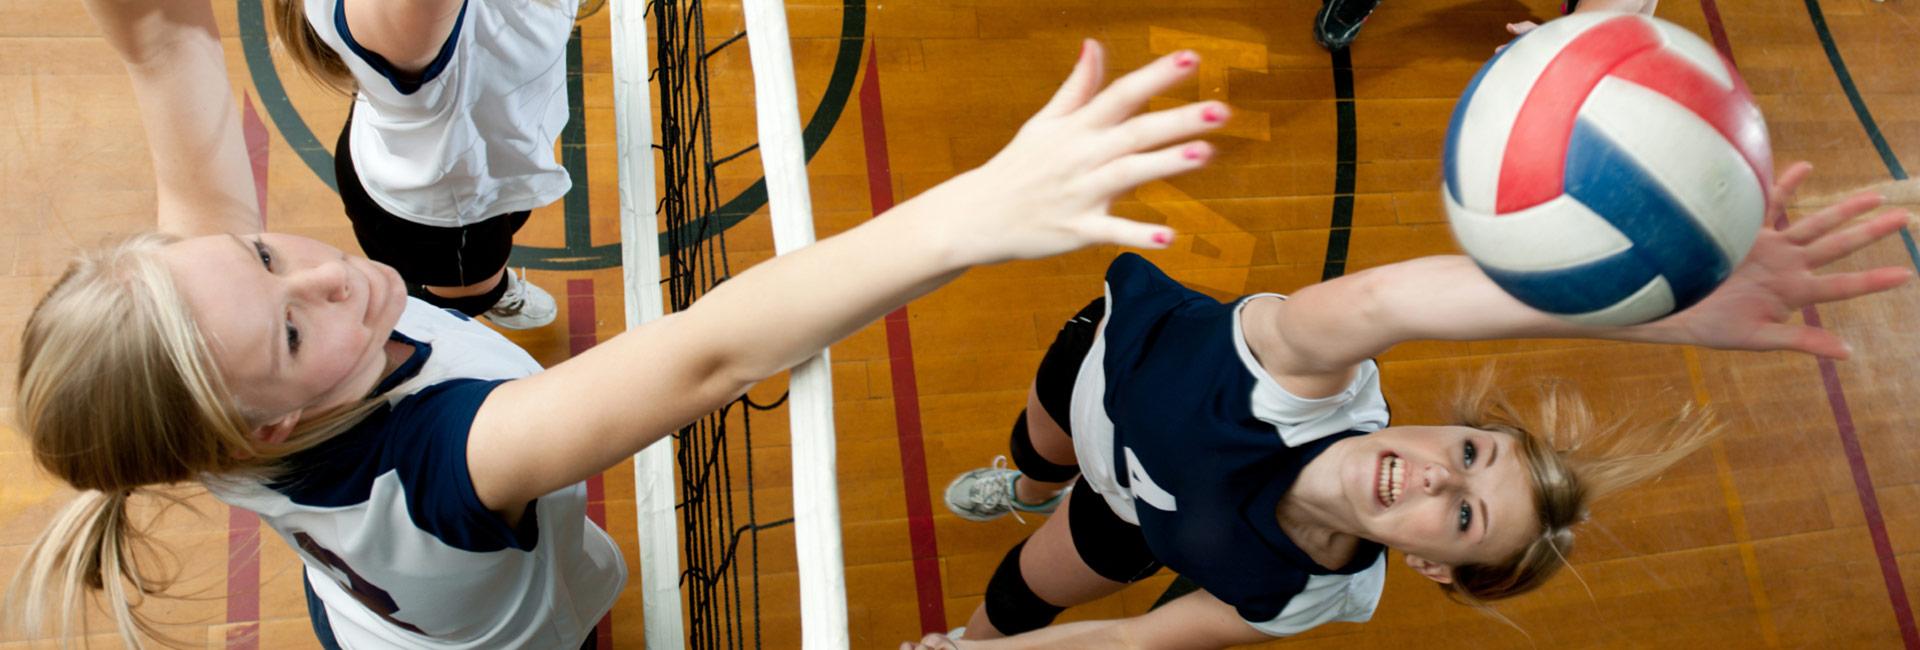 Dynamic-Warmup Volleyball